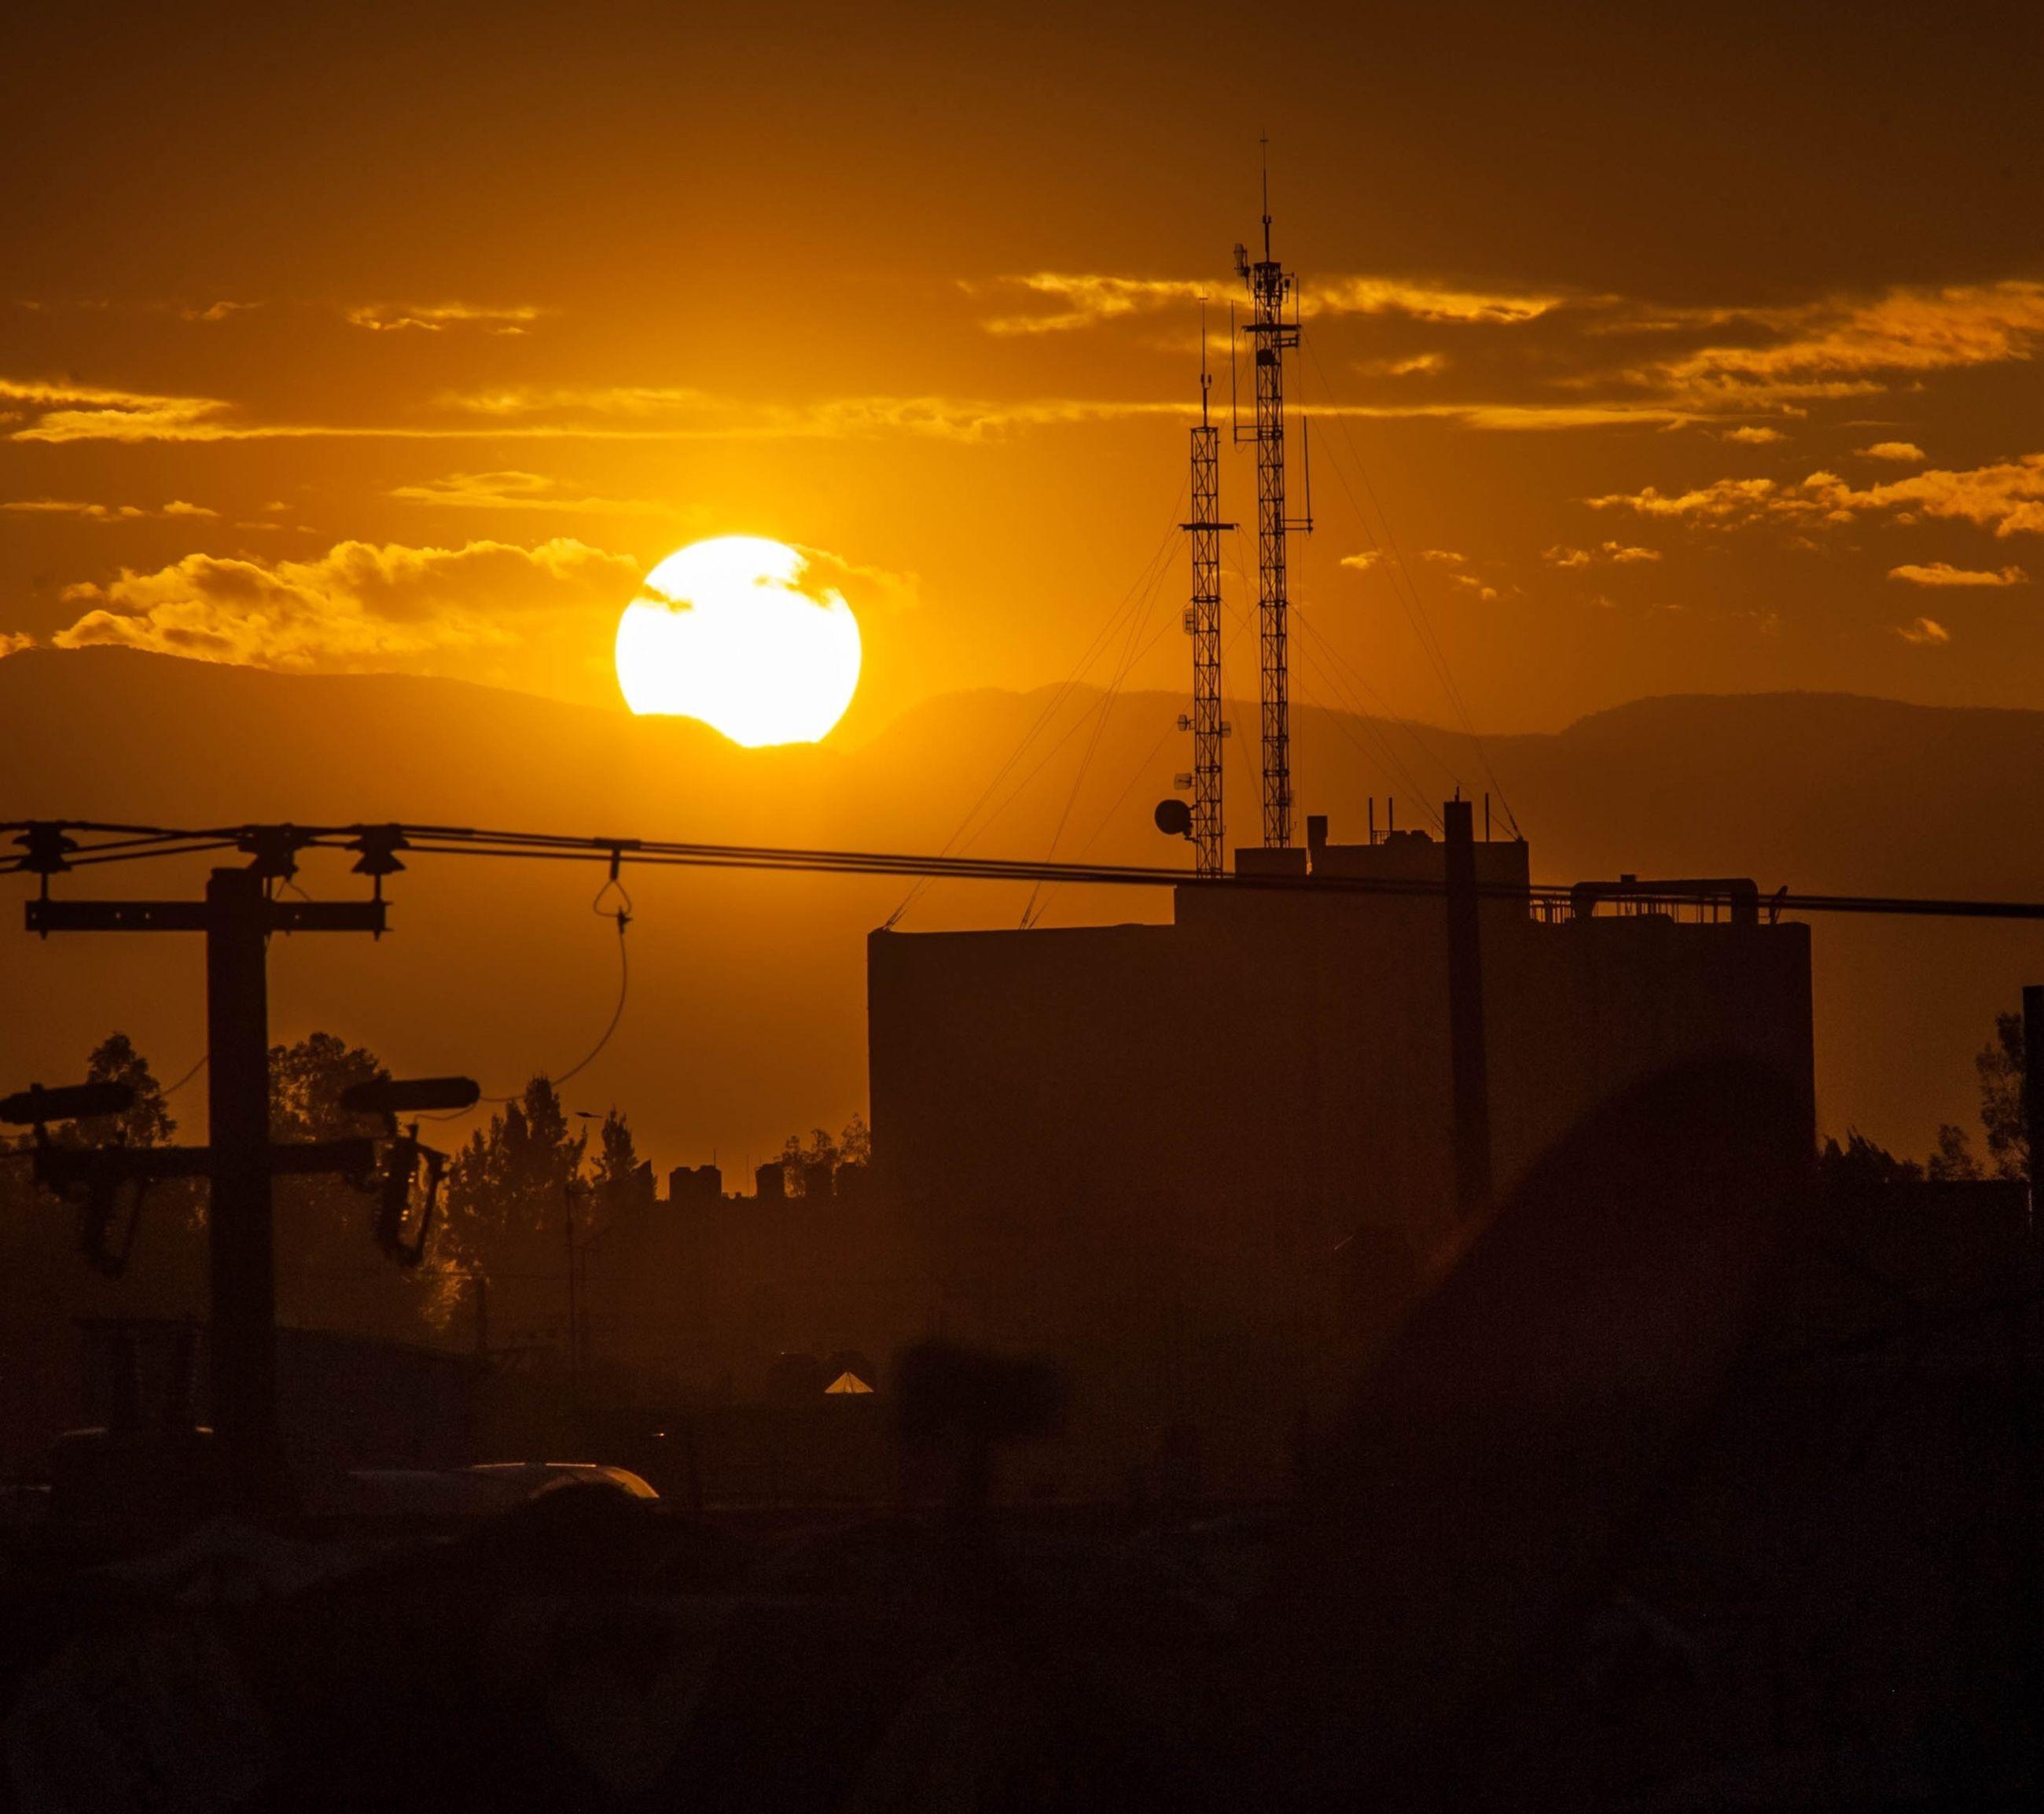 sunset, silhouette, sky, orange color, scenics, cloud - sky, beauty in nature, sun, electricity pylon, nature, water, tranquility, tranquil scene, street light, transportation, sea, power line, idyllic, connection, dusk